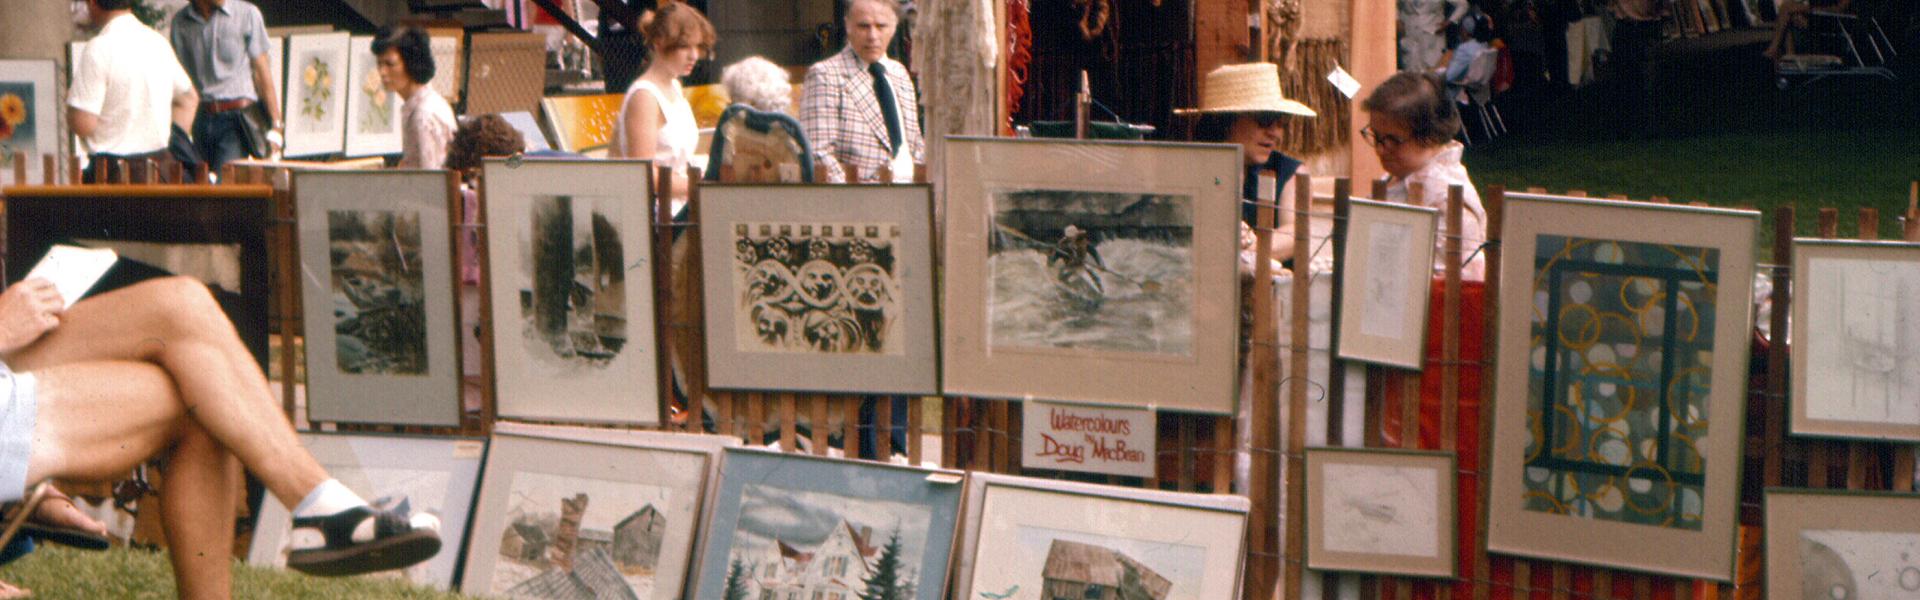 Toronto Outdoor Art Show 1977 copy 2.jpg